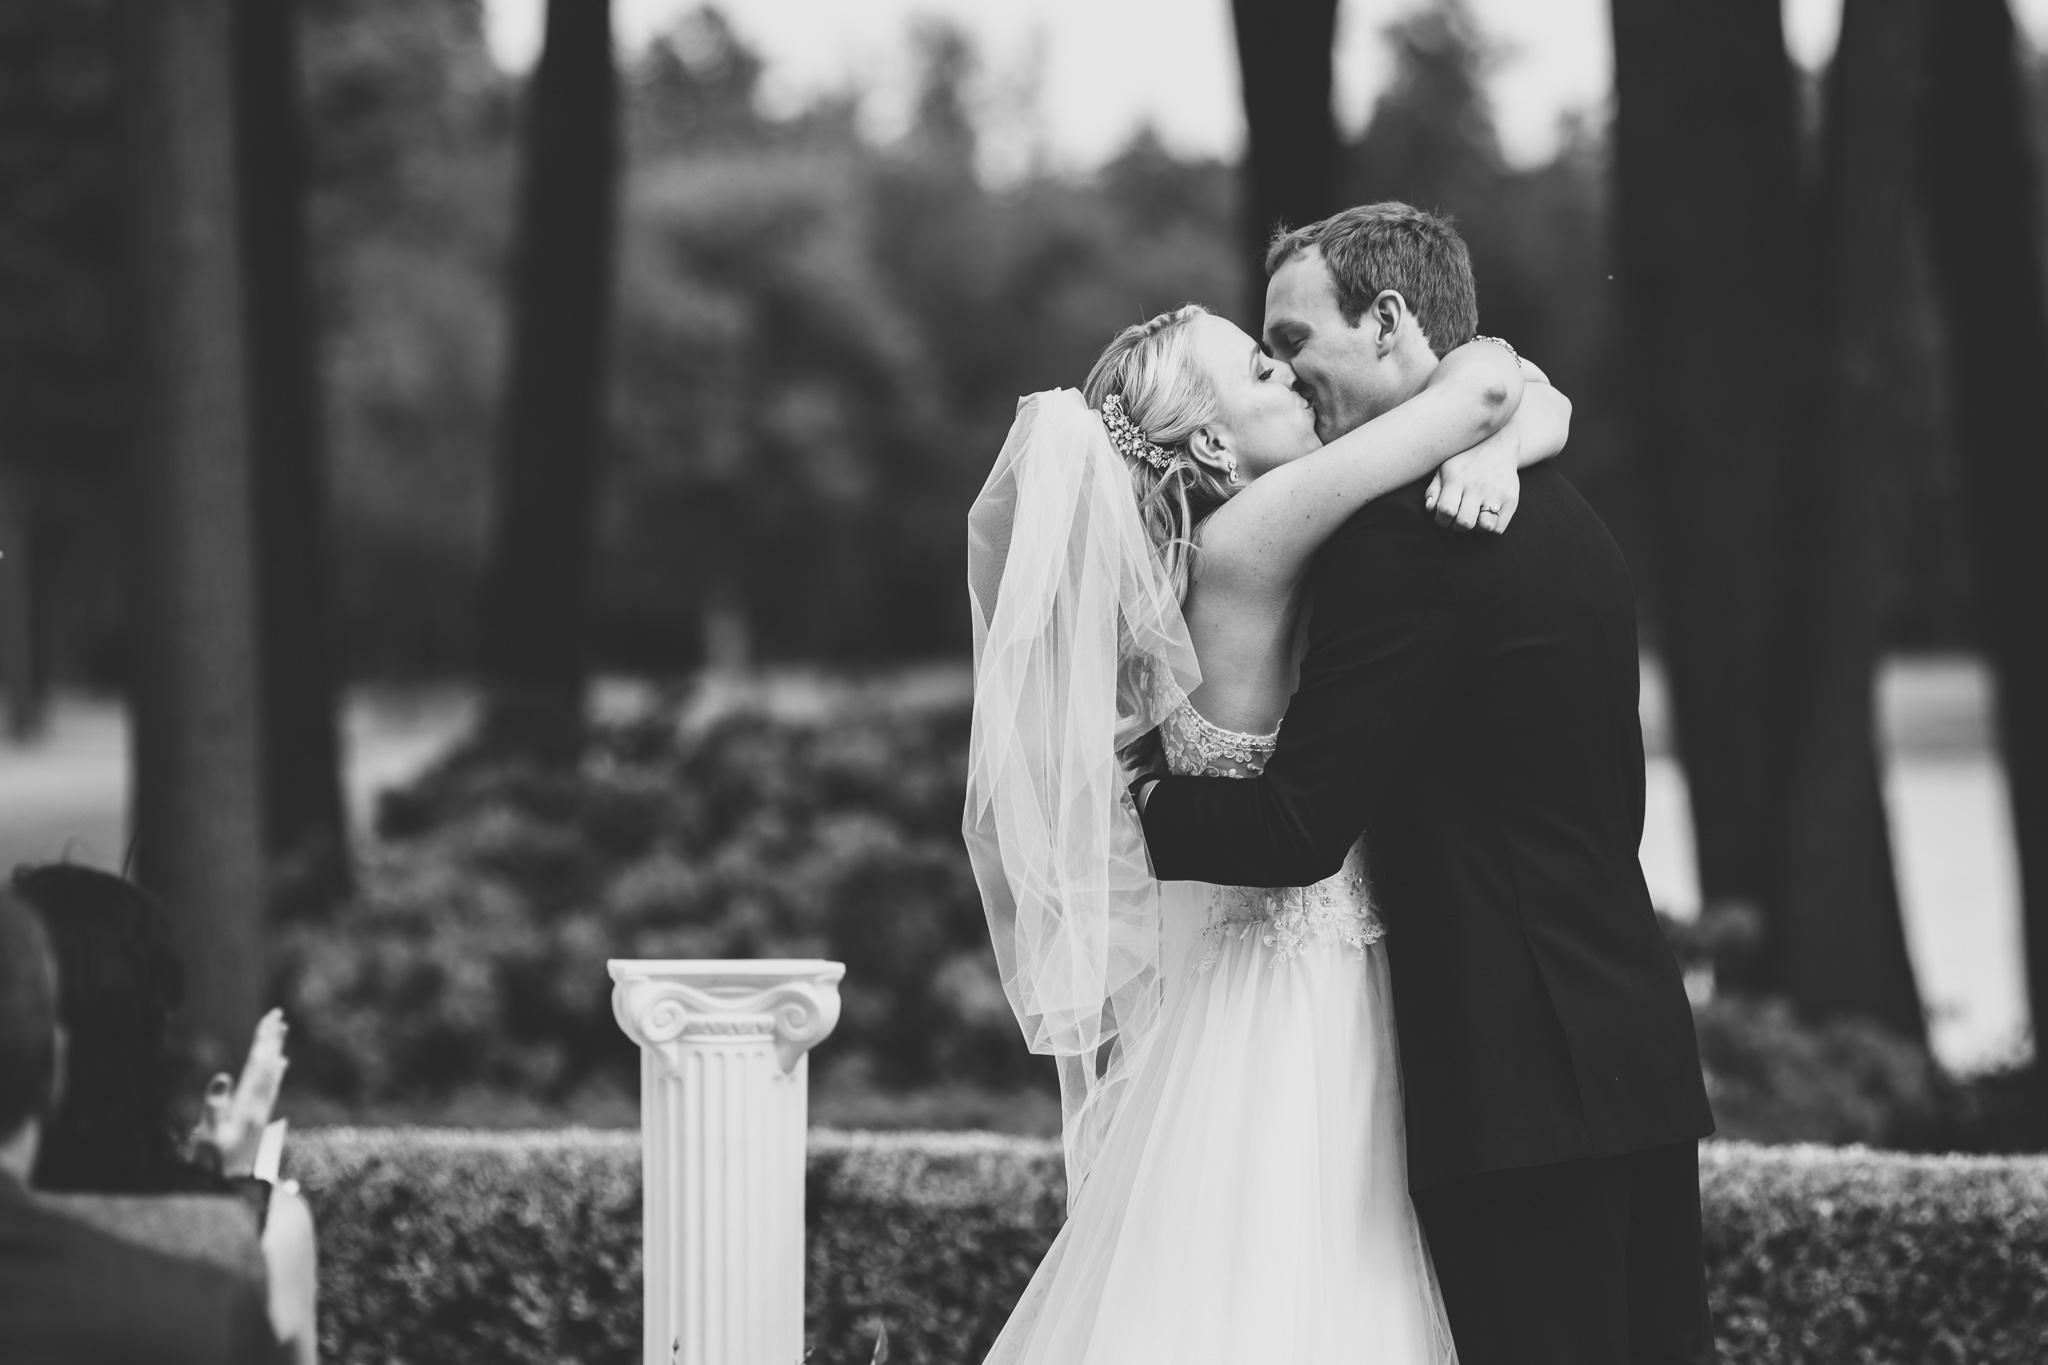 097-best-detroit-michigan-outdoor-wedding-photographer.jpg